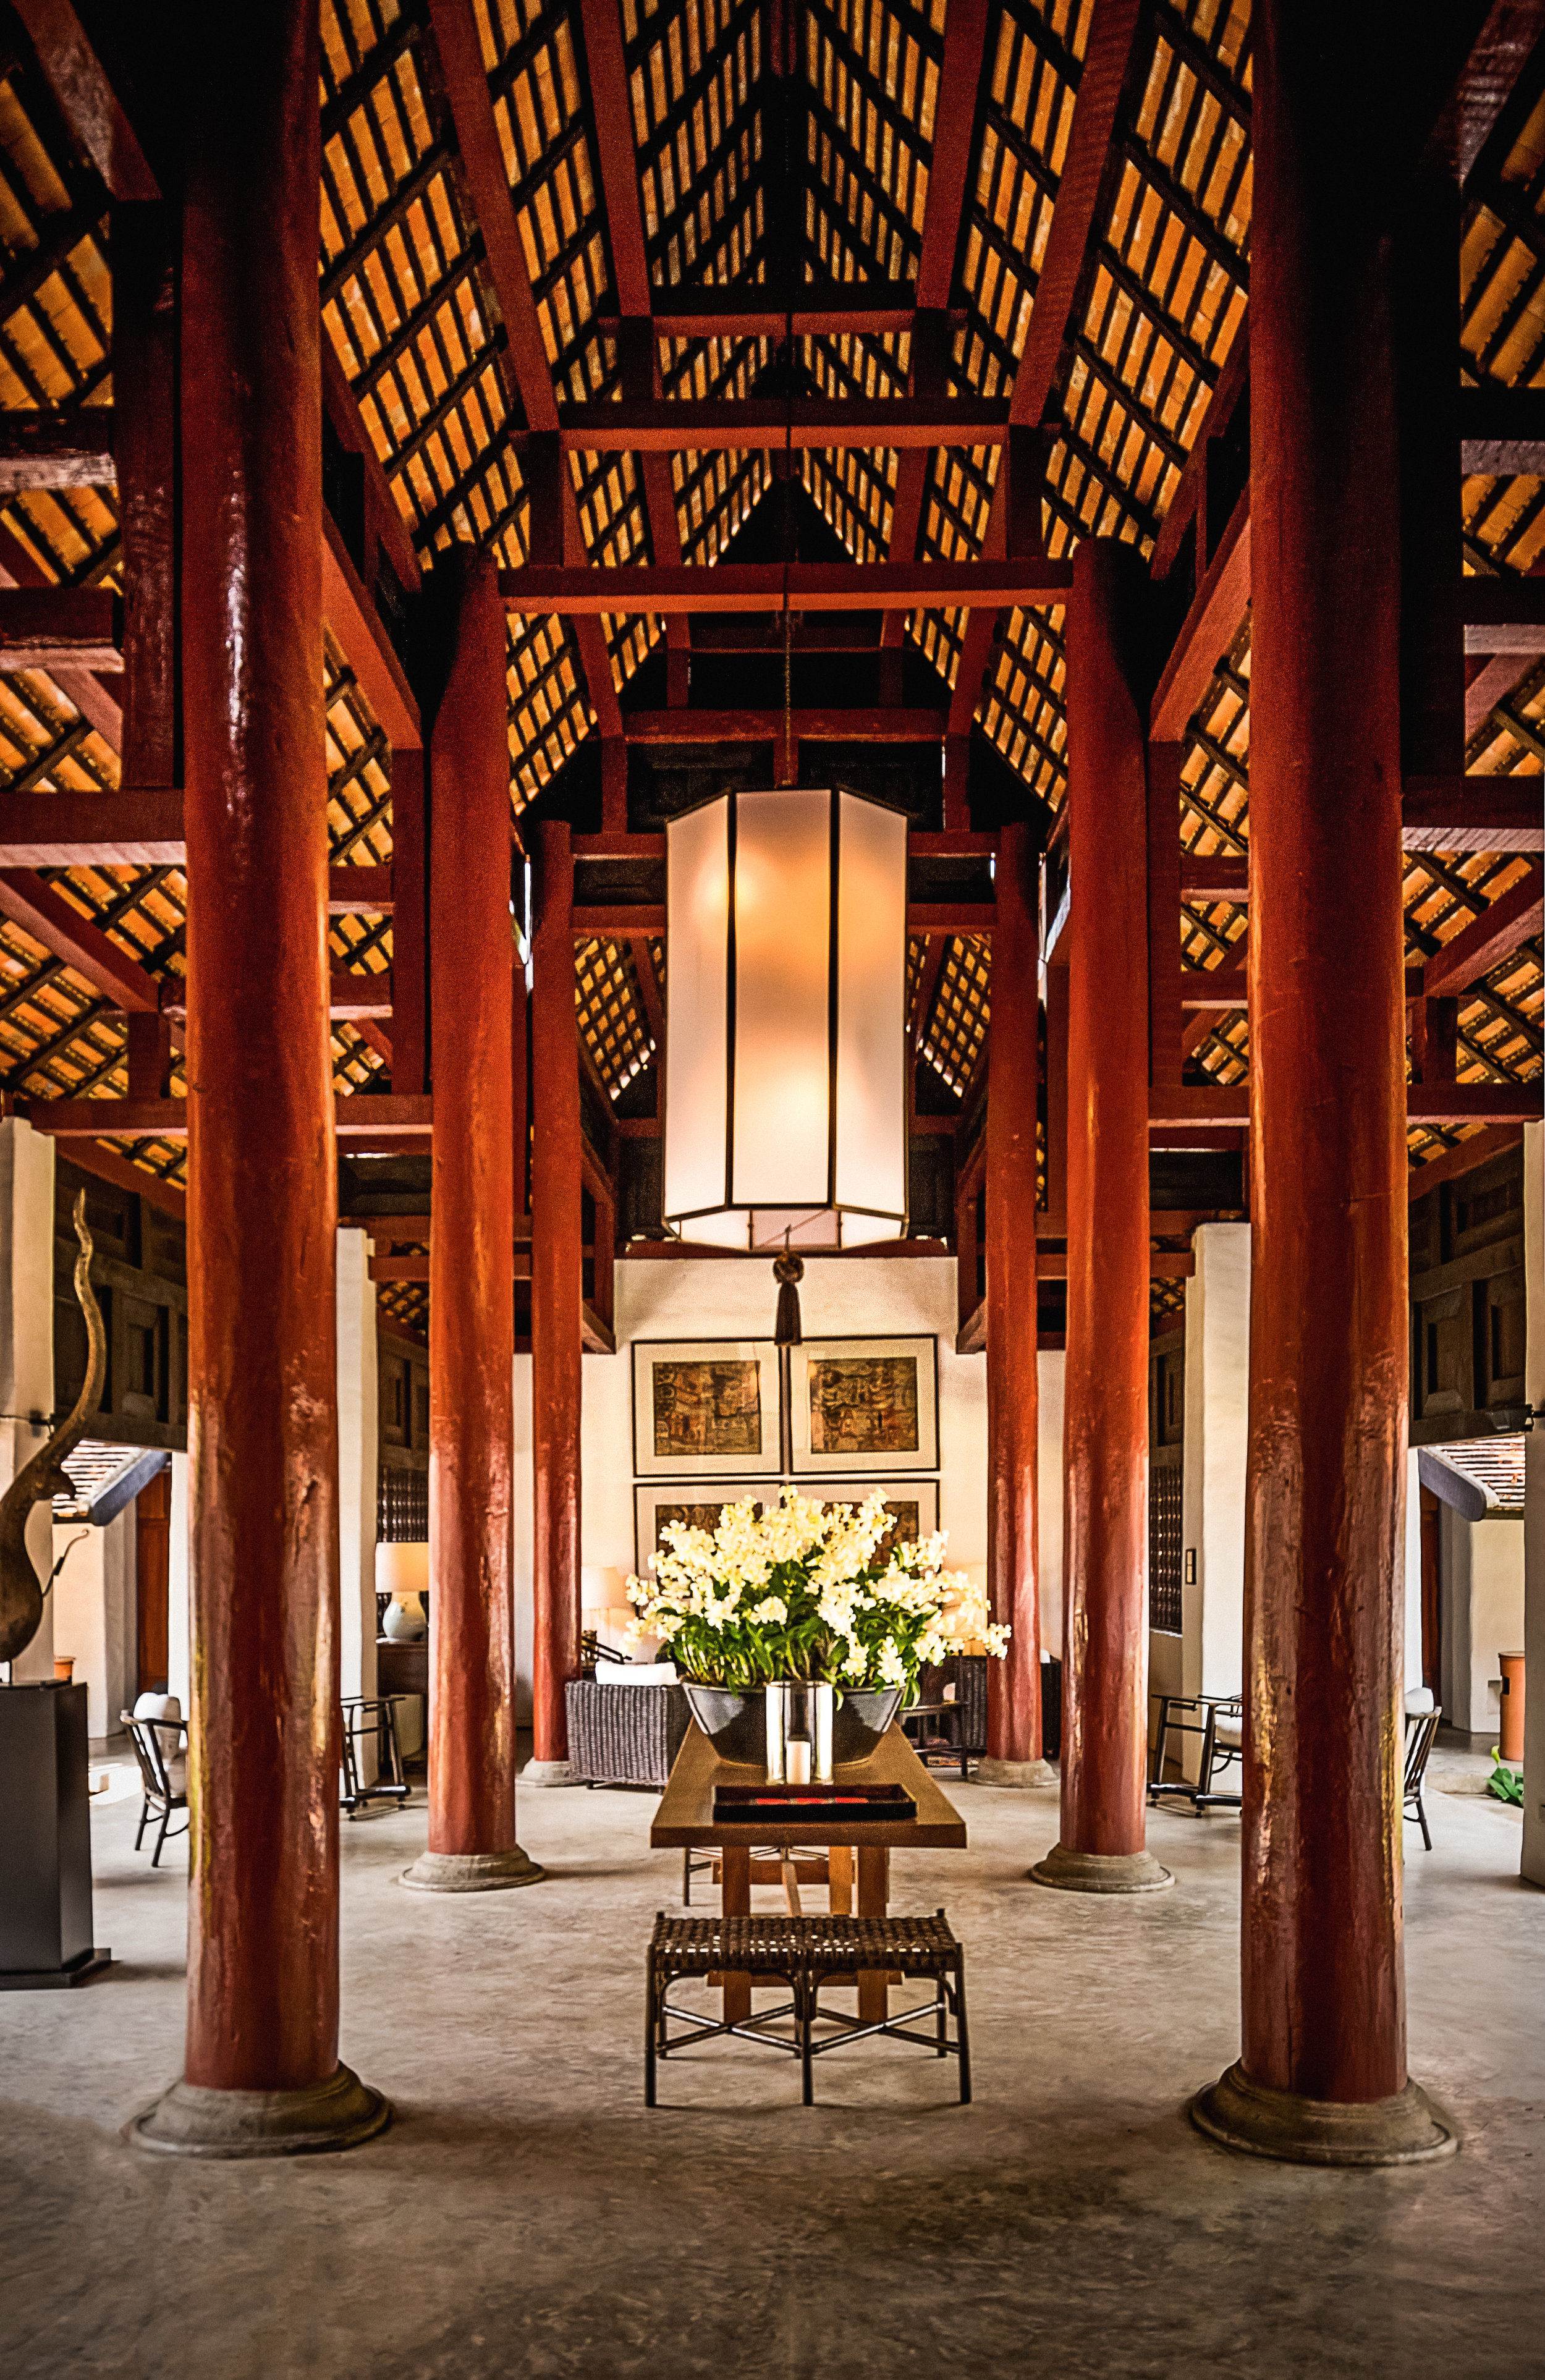 Rachamankha Boutique Hotel Chiang Mai Thailand